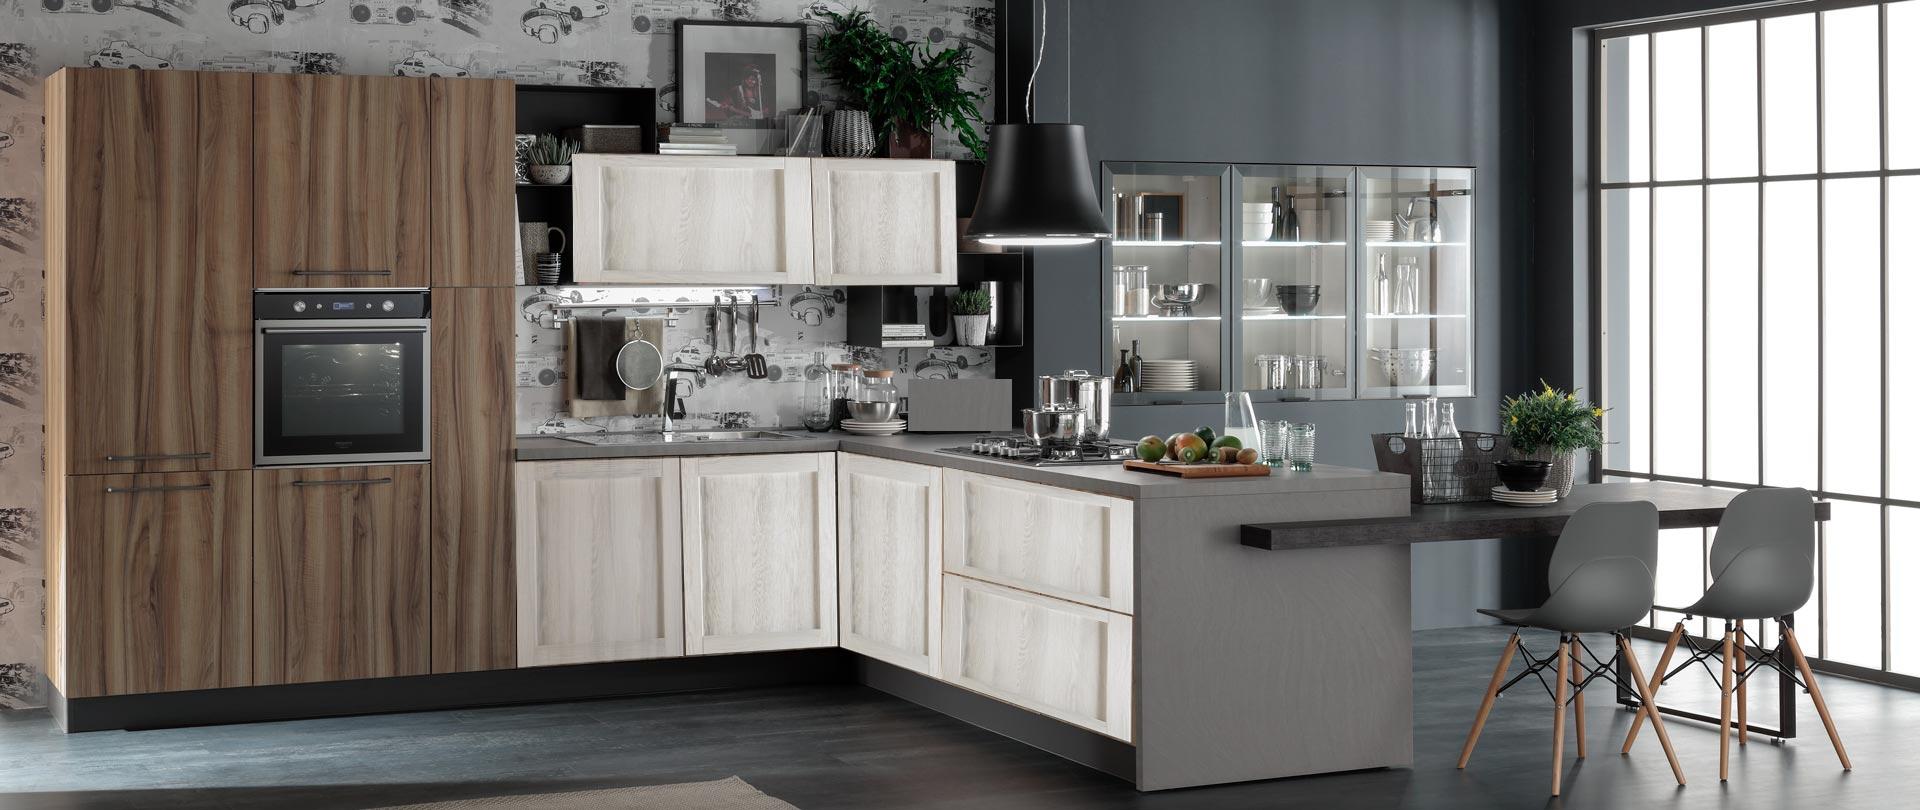 Cucina con penisola living con tavolo integrato in offerta for Cucina living